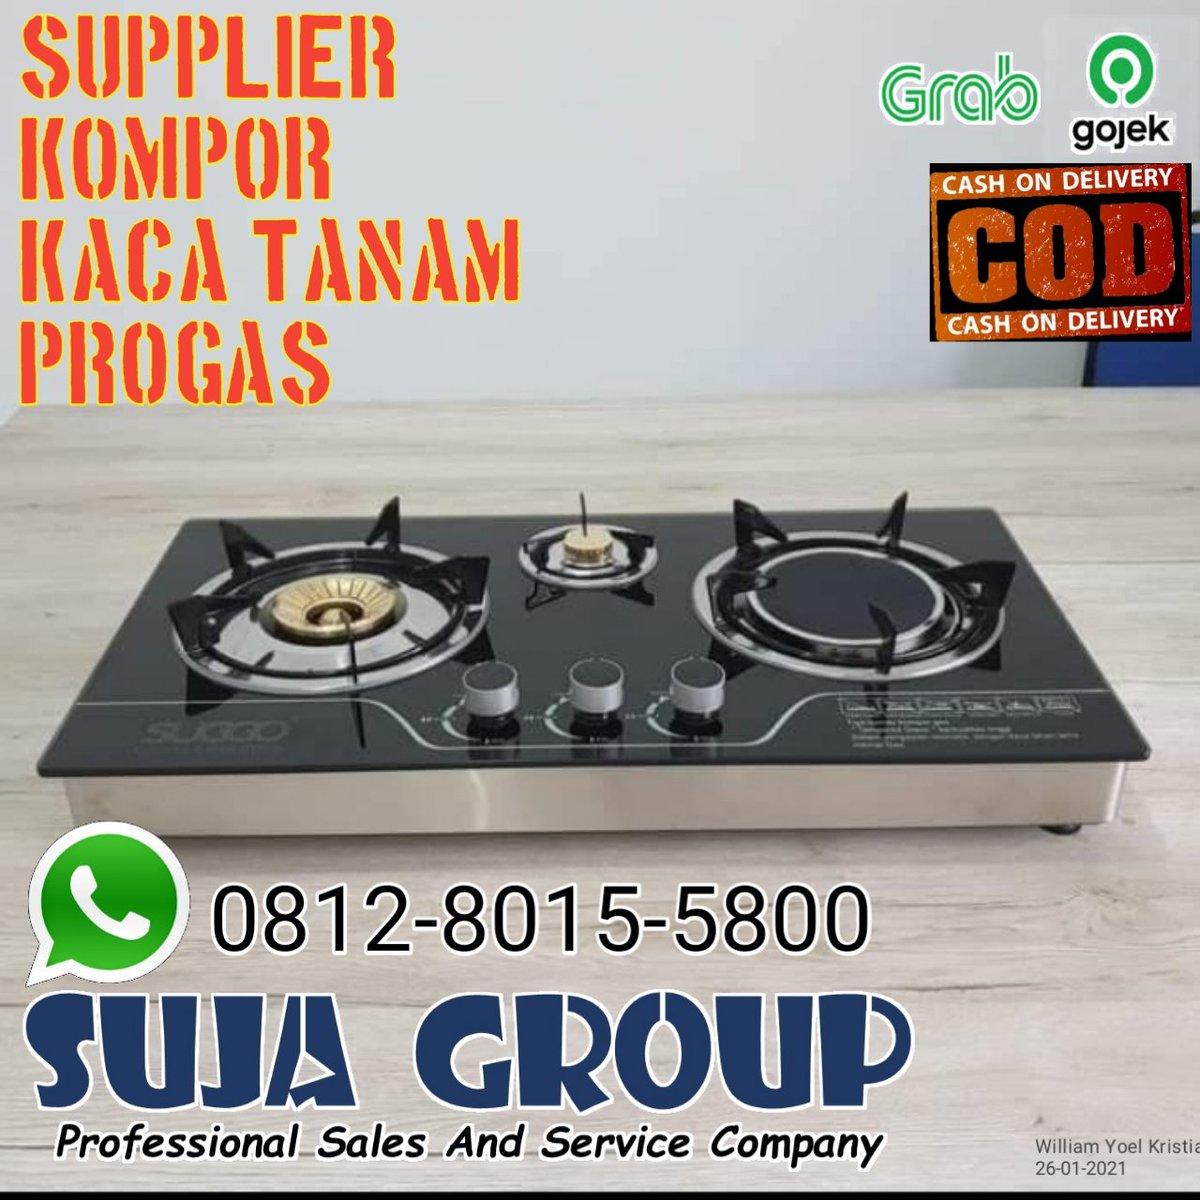 COD..Grosir Kompor Gas Kaca 2 Dan 3 Tungku Merk ProGas Di NTT, Wa : 0812-8015-5800 Bayar Di Tempat.. Wa 0812-8015-5800, Grosir Kompor Gas Kaca 2 Dan 3 Tungku Merk ProGas Di NTT, Jual Kompor Gas Portable Camping Merk ProGas Di Sumatera Barat, Harga Kompor Gas Rata 2 Dan 3 Tungku https://t.co/ZBmVzhnwiW